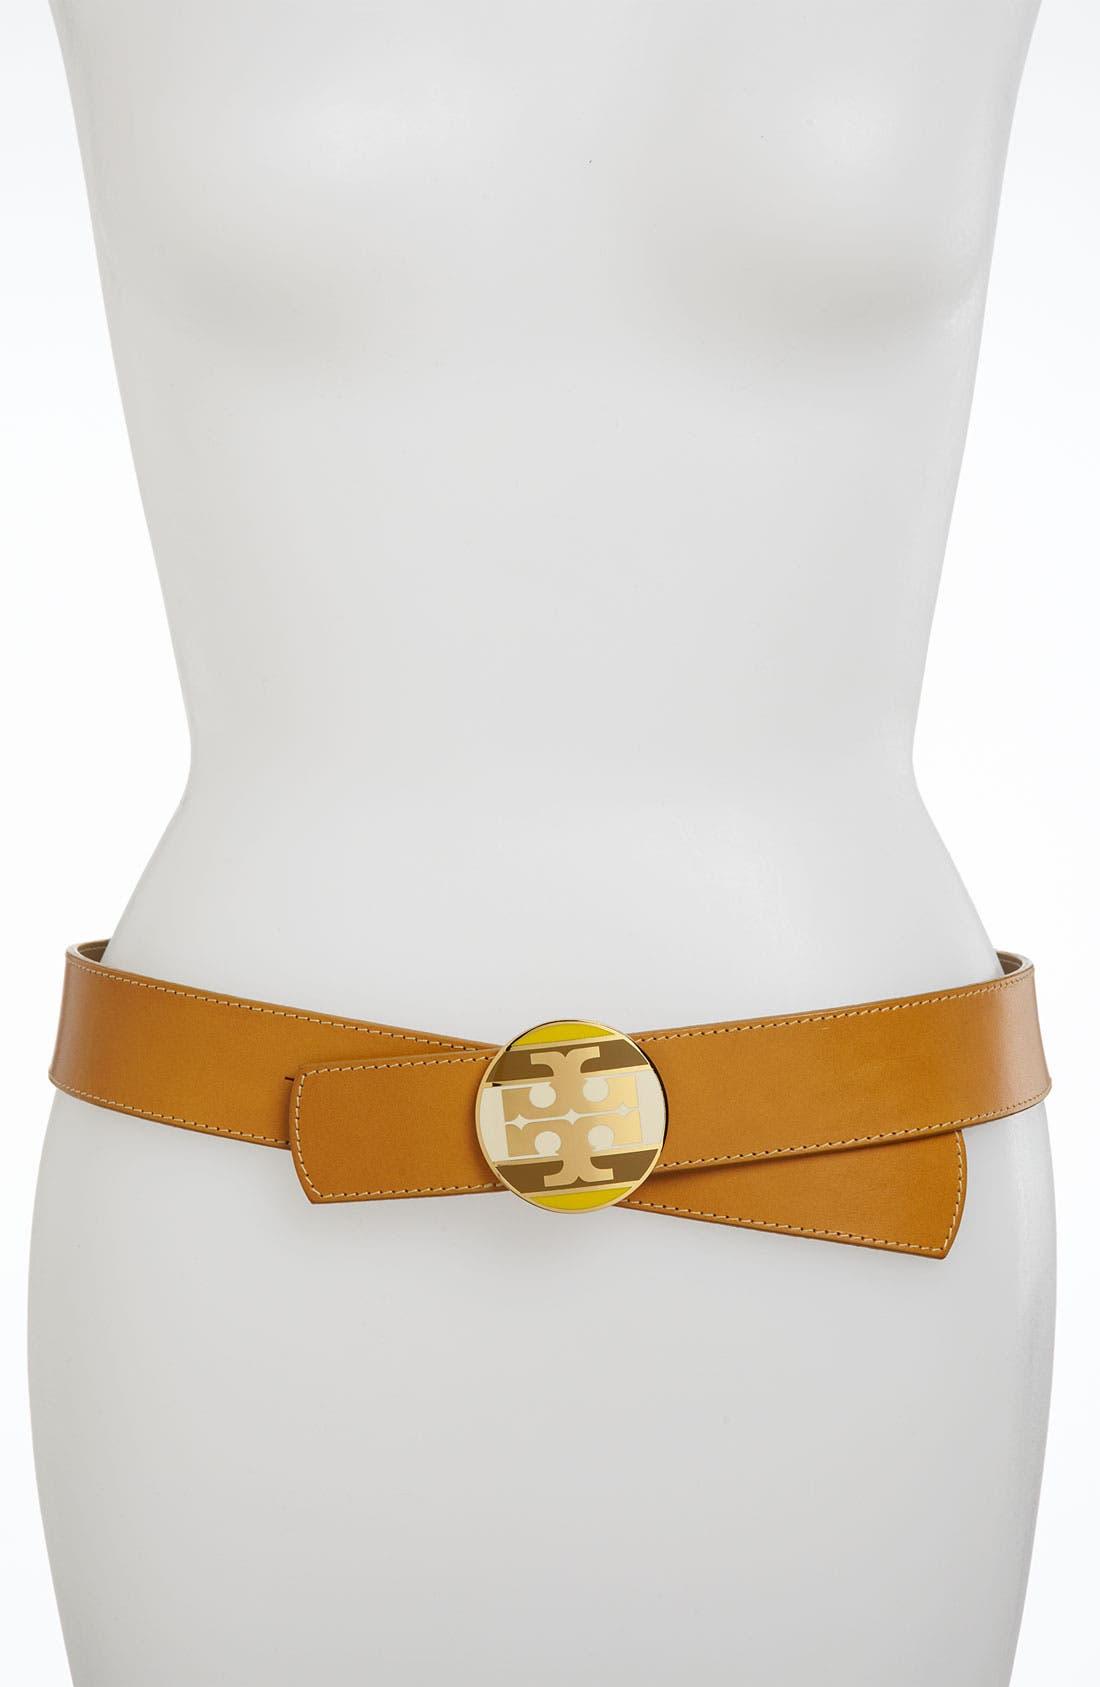 Alternate Image 1 Selected - Tory Burch Reversible Belt